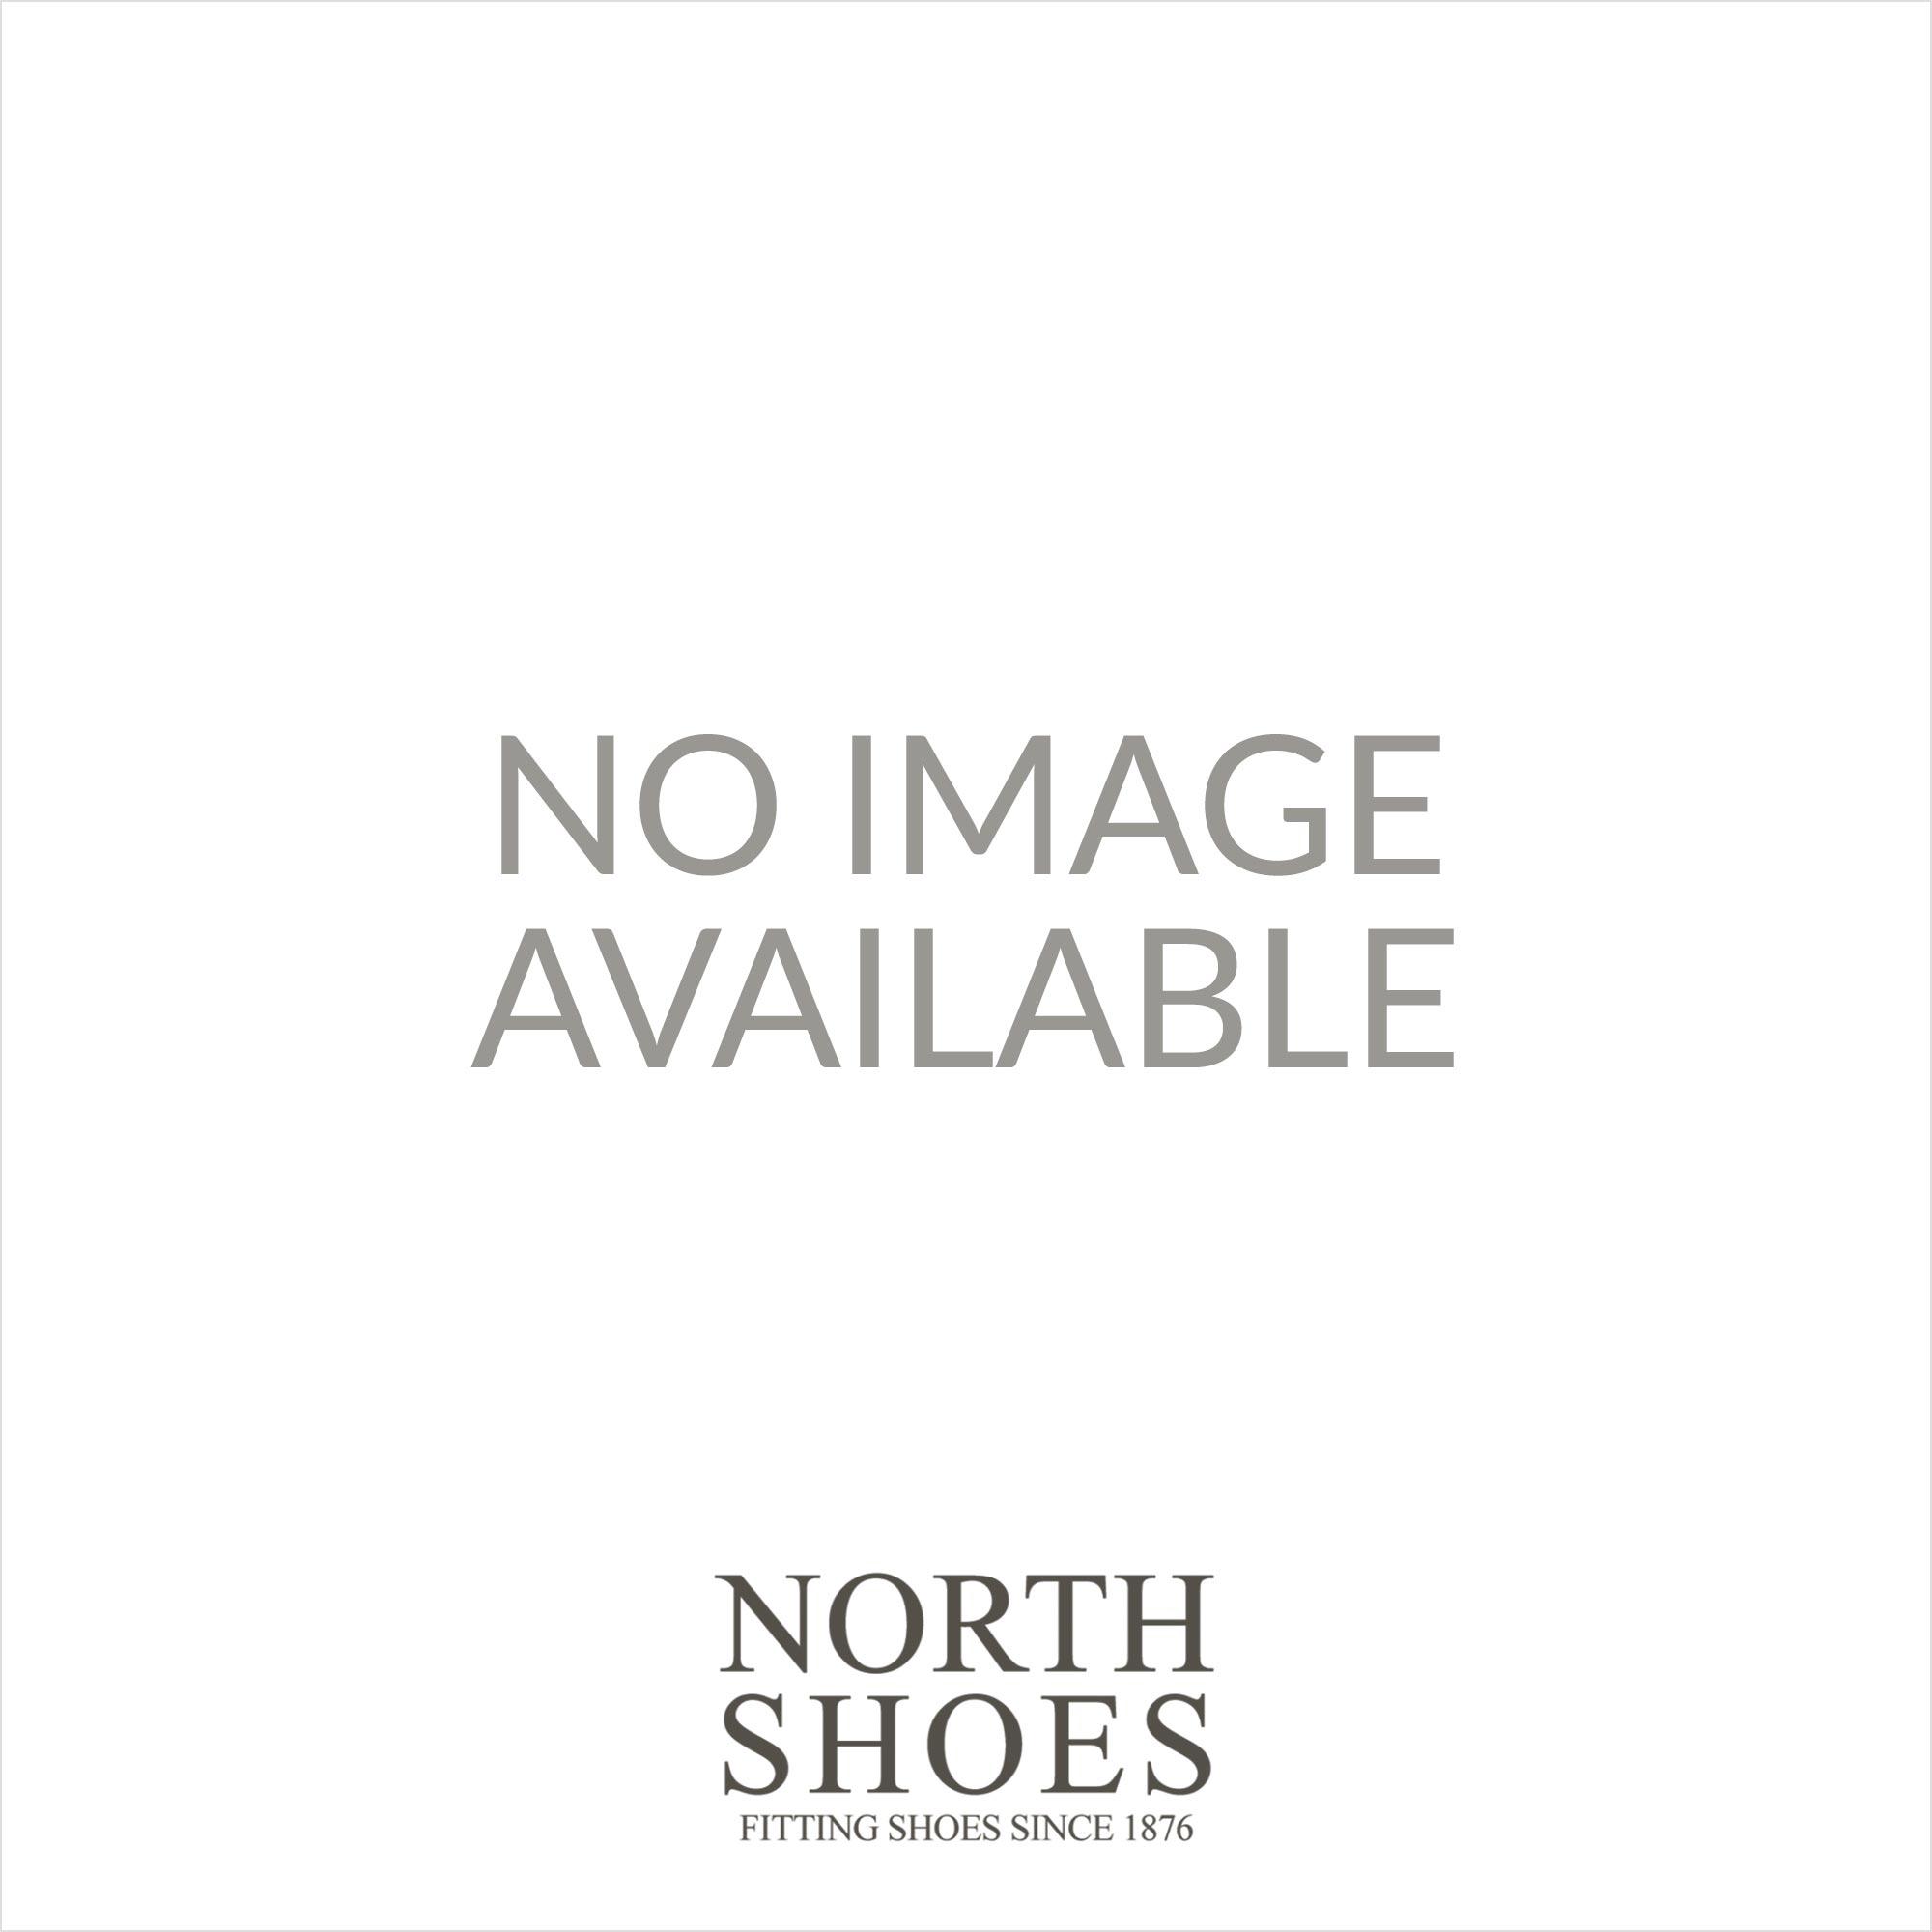 15520-05 Rose Leather Womens Slip On Mule Sandal